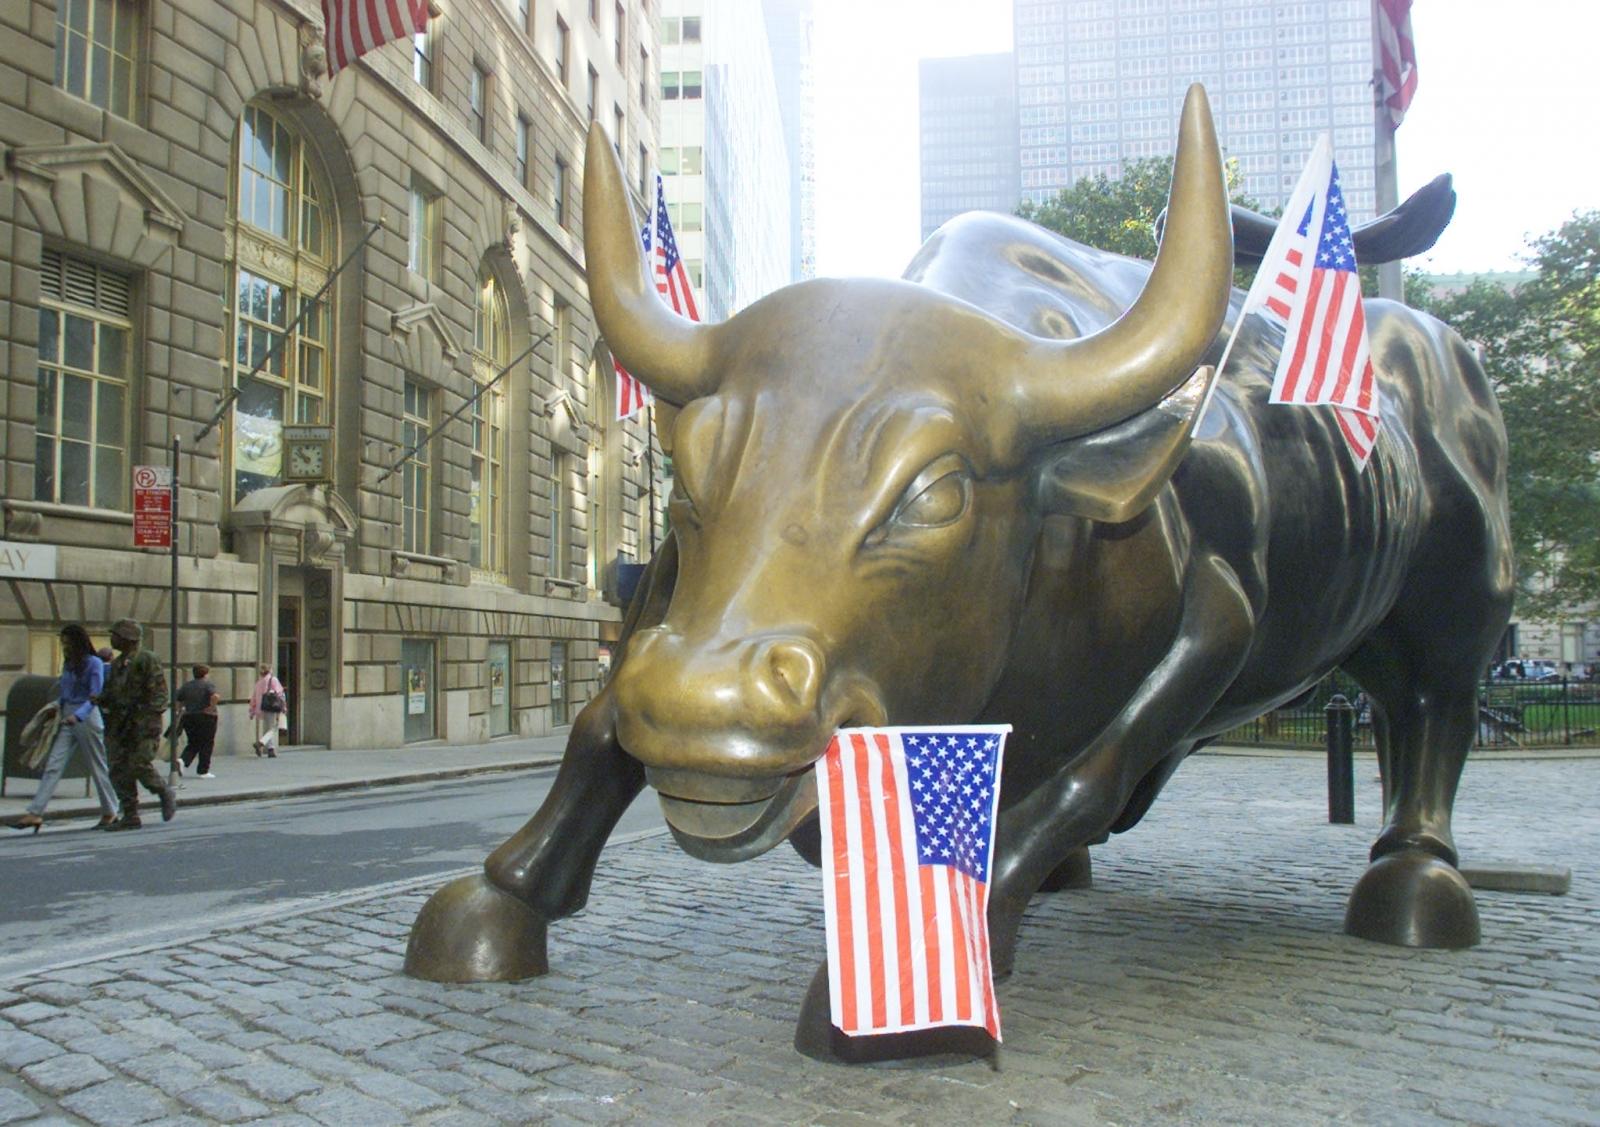 Charging Bull statue